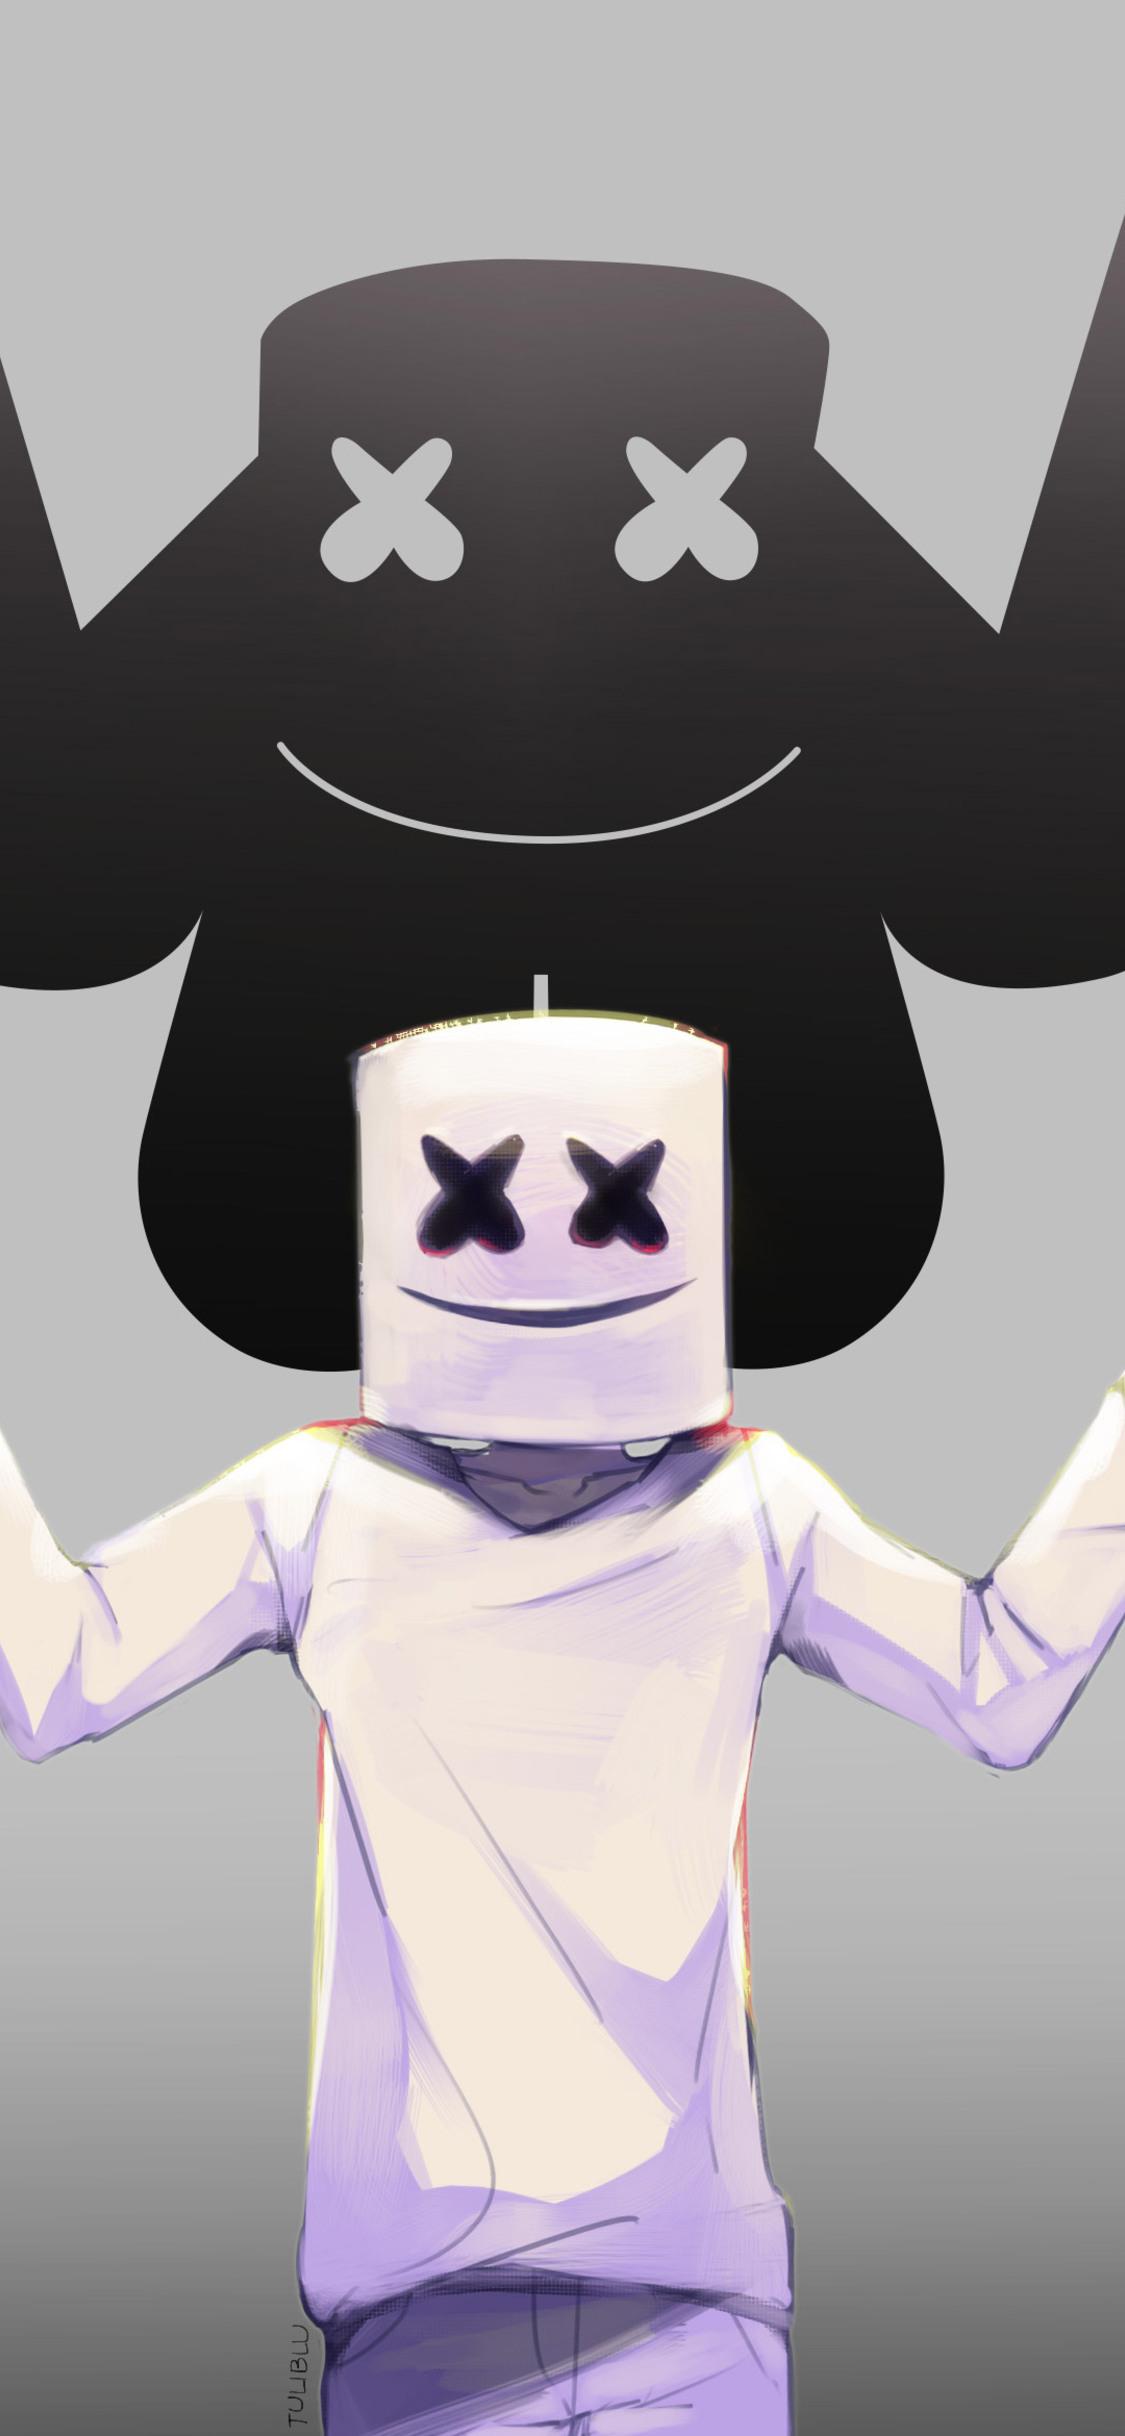 Marshmello Dj Artwork Iphone Xsiphone Iphone X